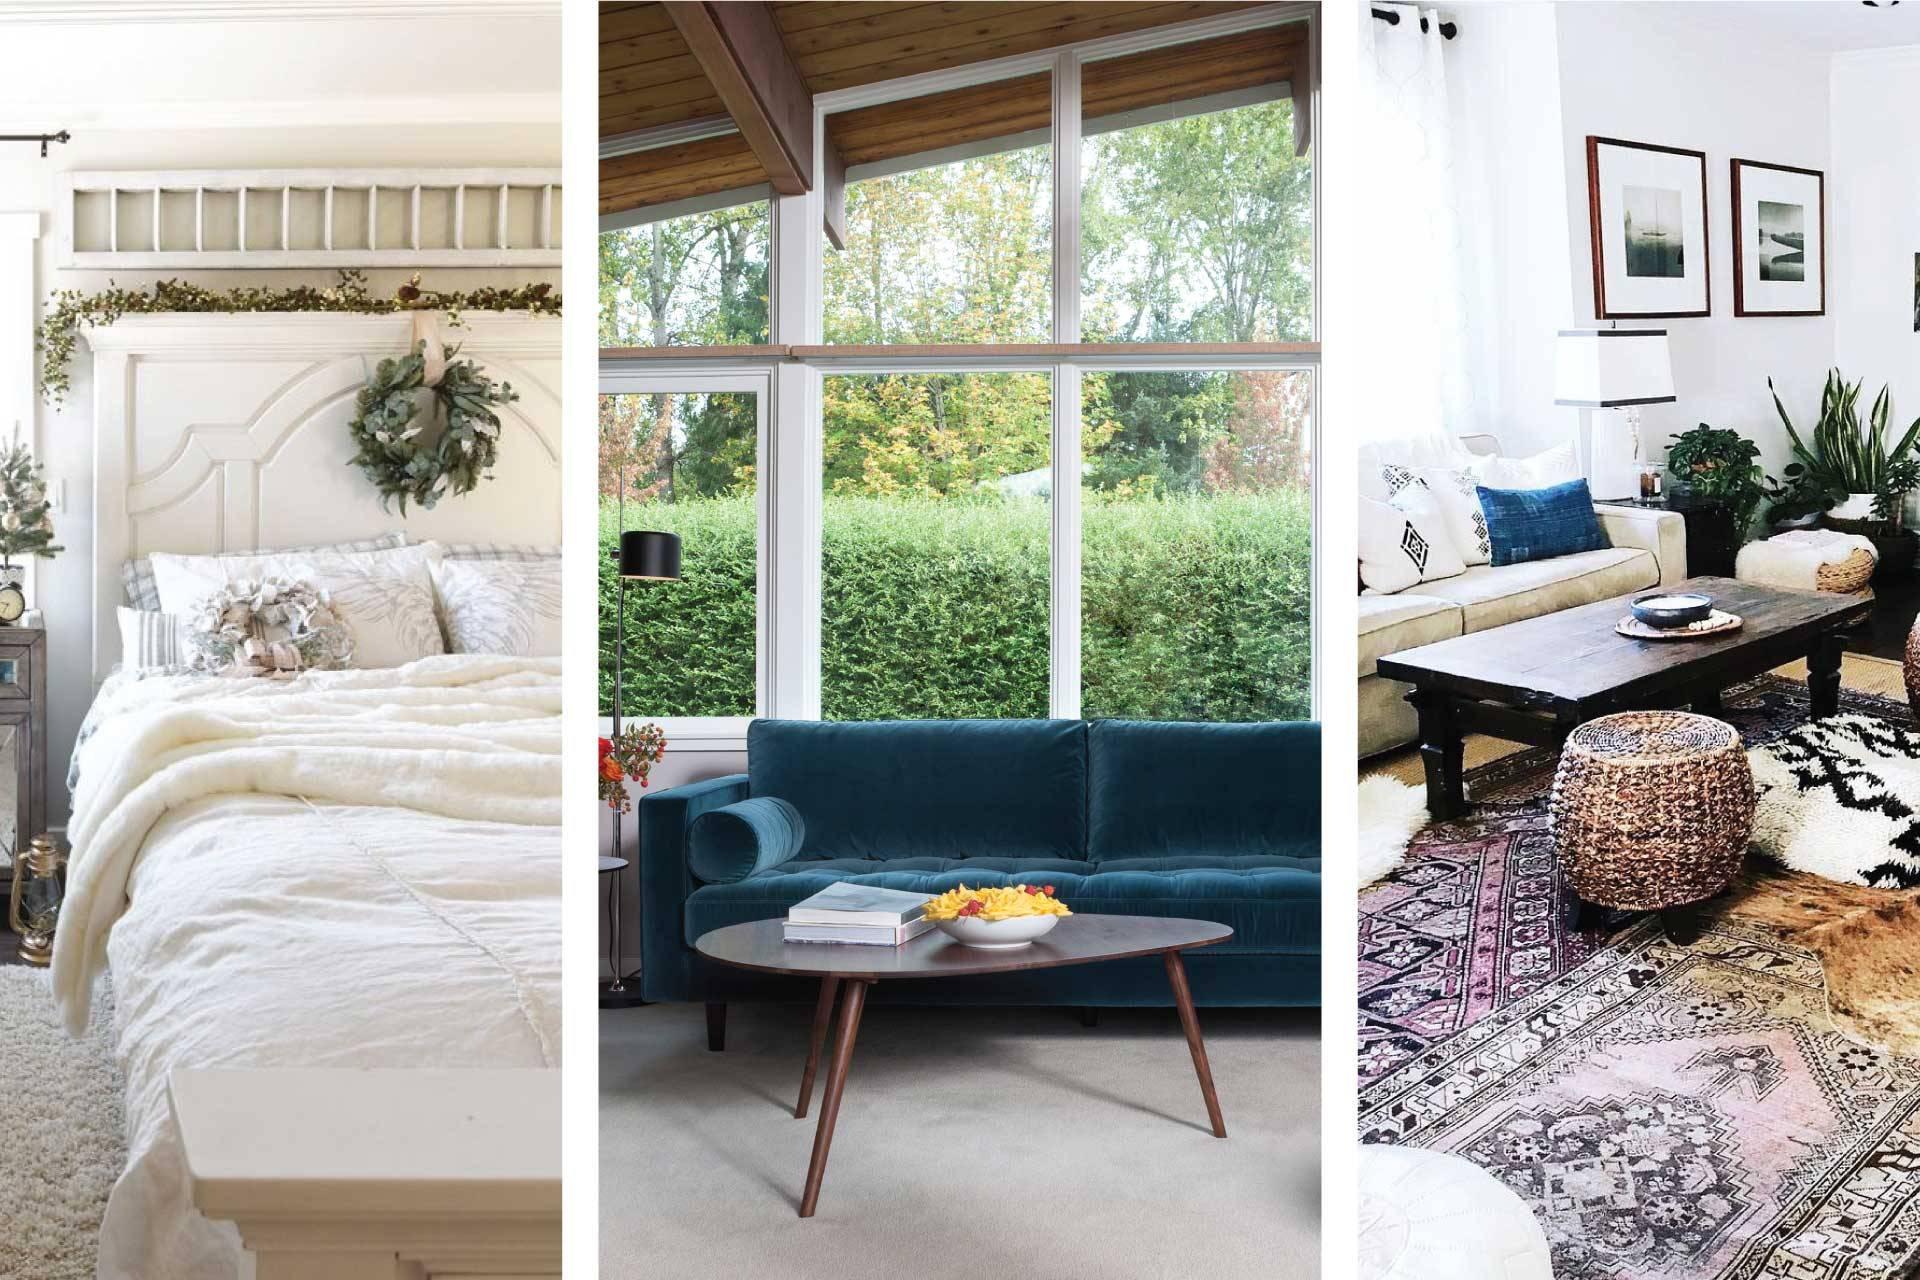 Interior Design Styles 10 Popular Types Explained